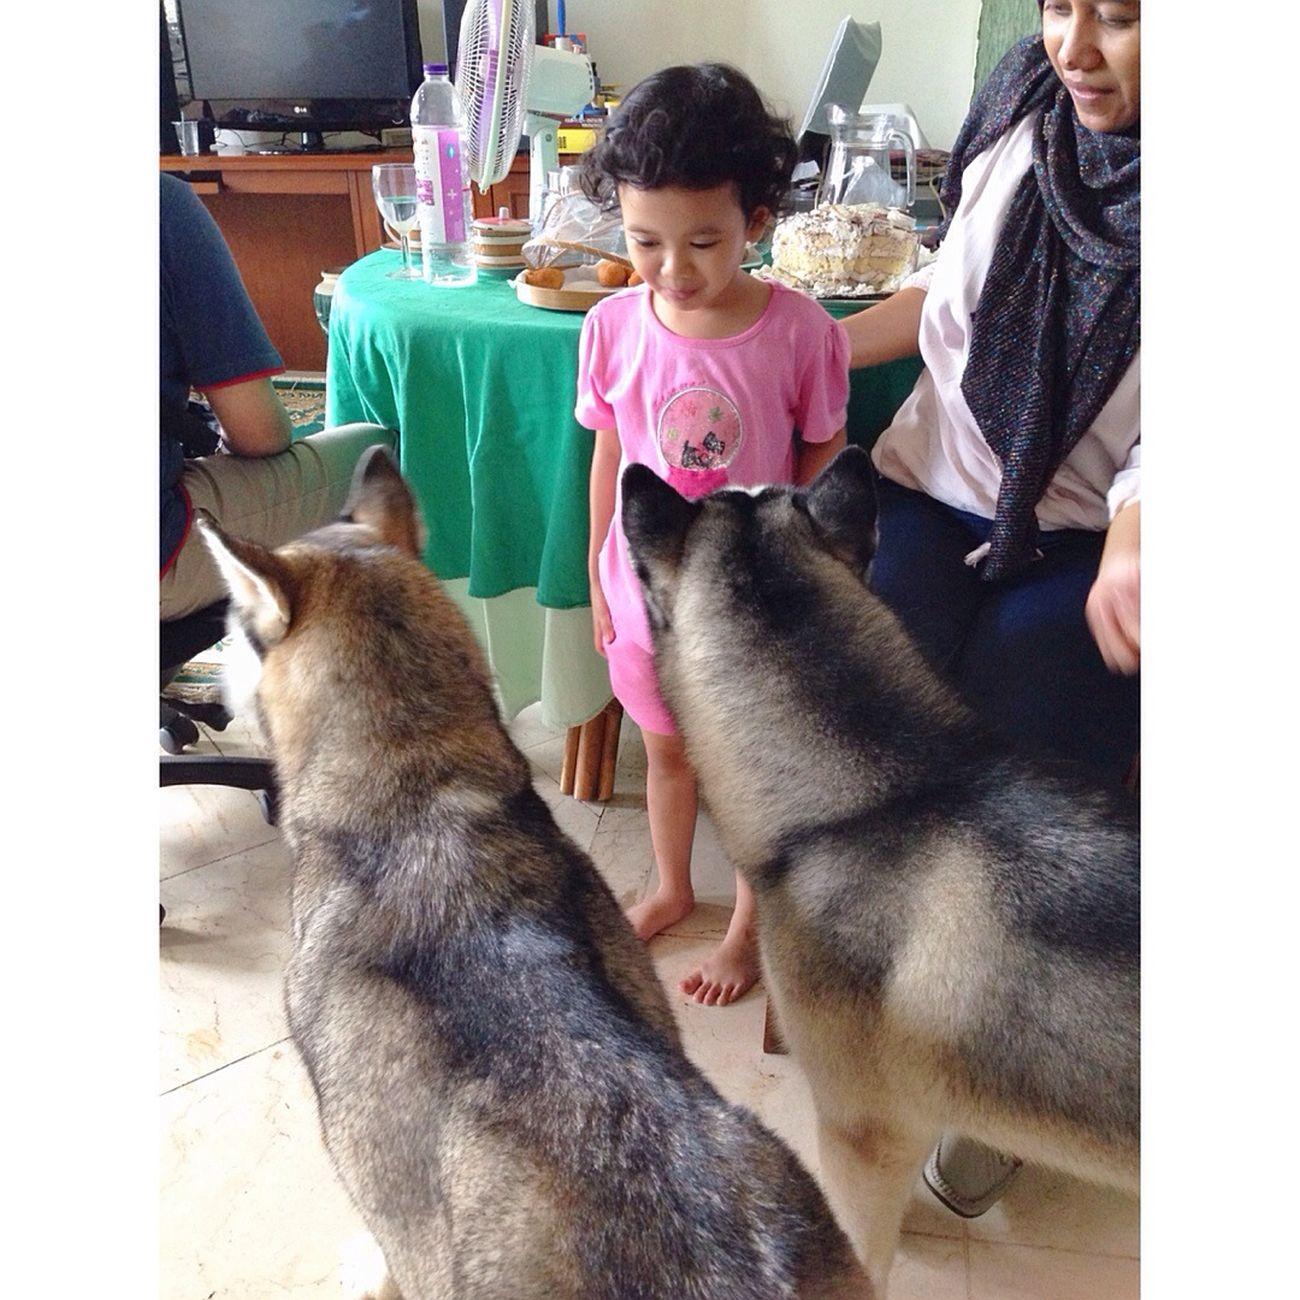 Driaz together with, Kazuo & Baileys. Kids By ITag Driaz And Friends By ITag Friends By ITag Pets By ITag Animal By ITag Kids Familia By ITag